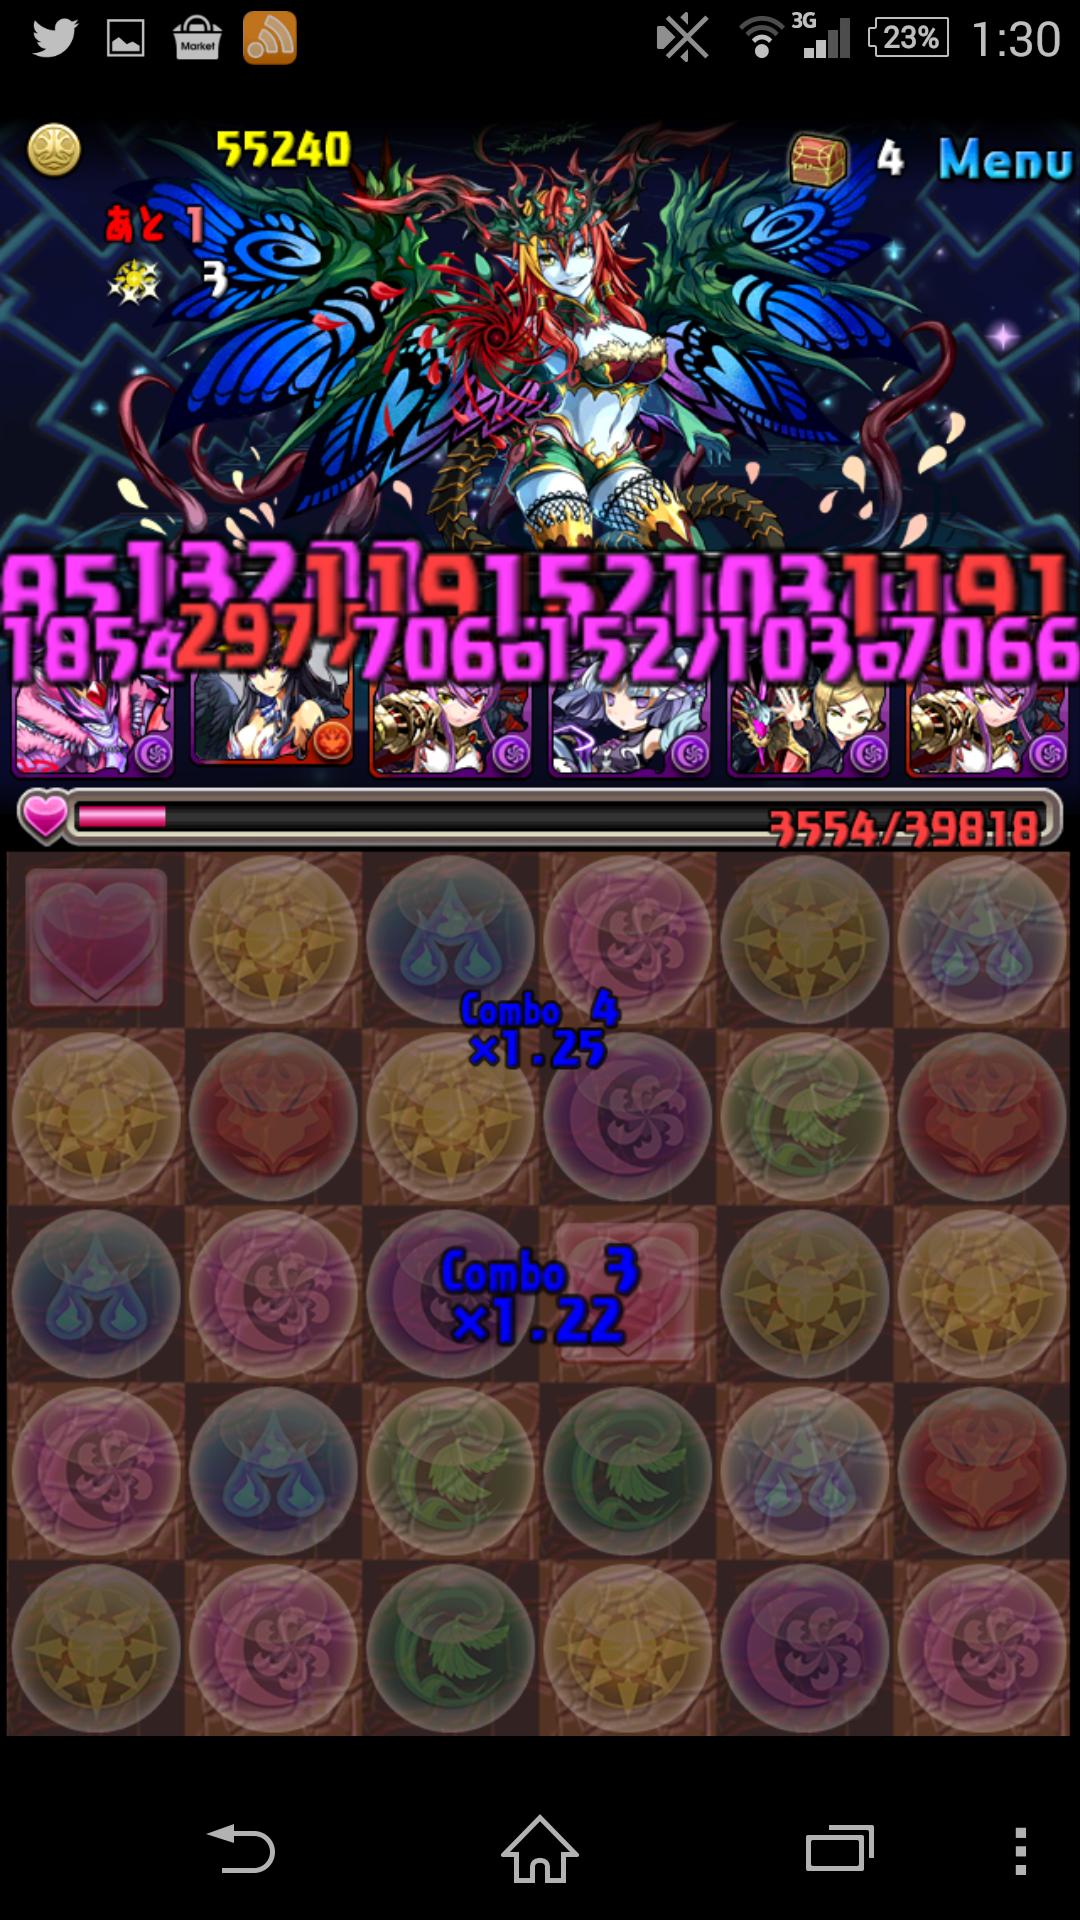 Screenshot_2014-12-19-01-30-08.png